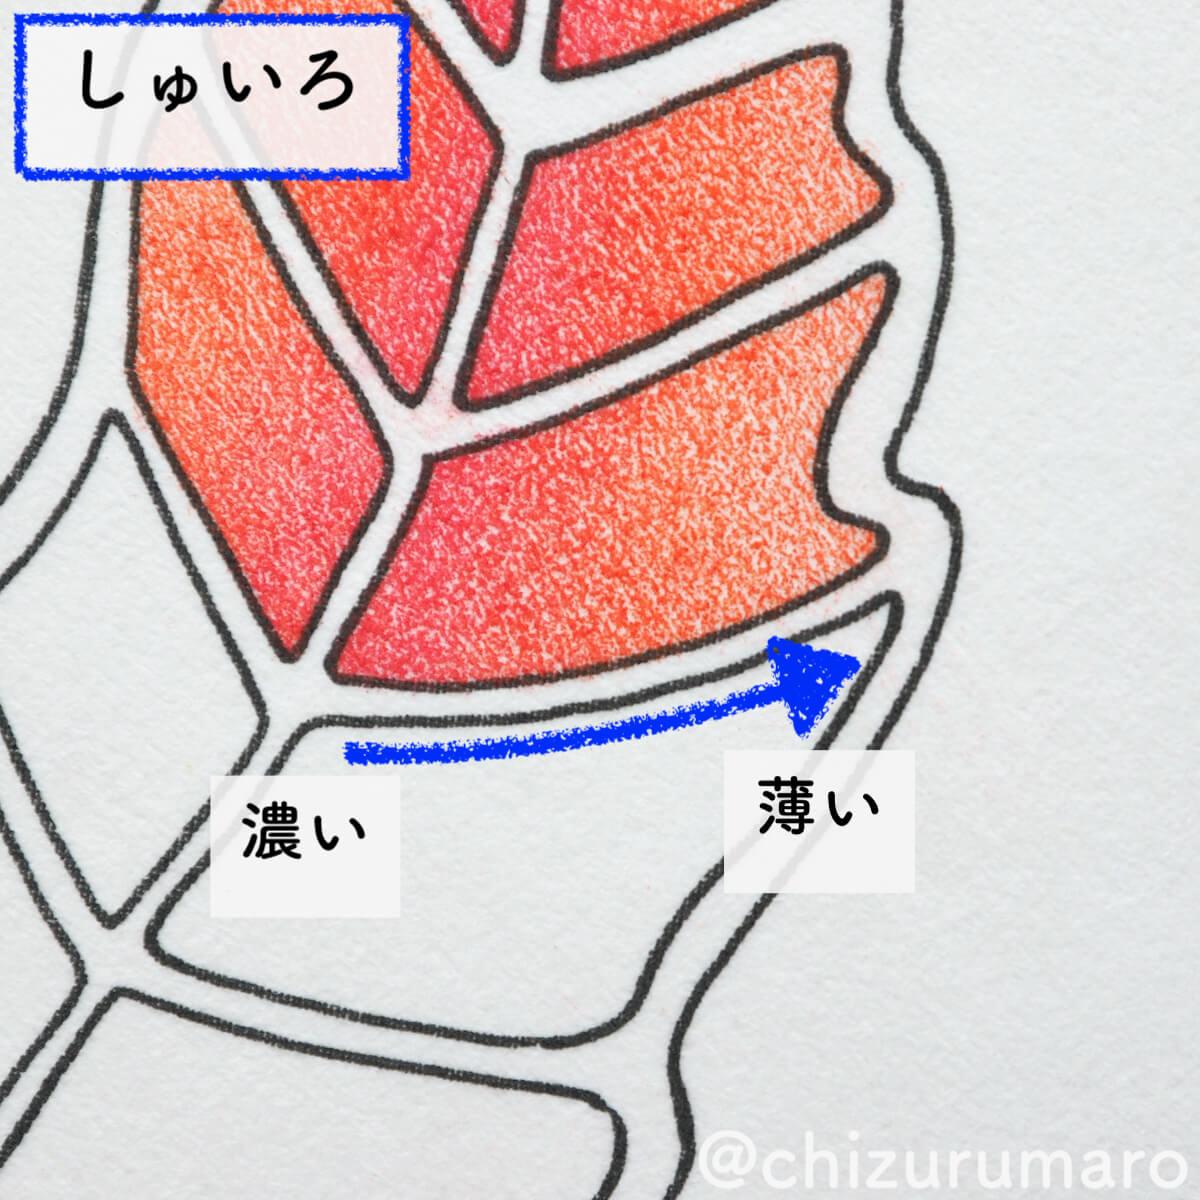 f:id:chizurumaro:20200603122225j:plain